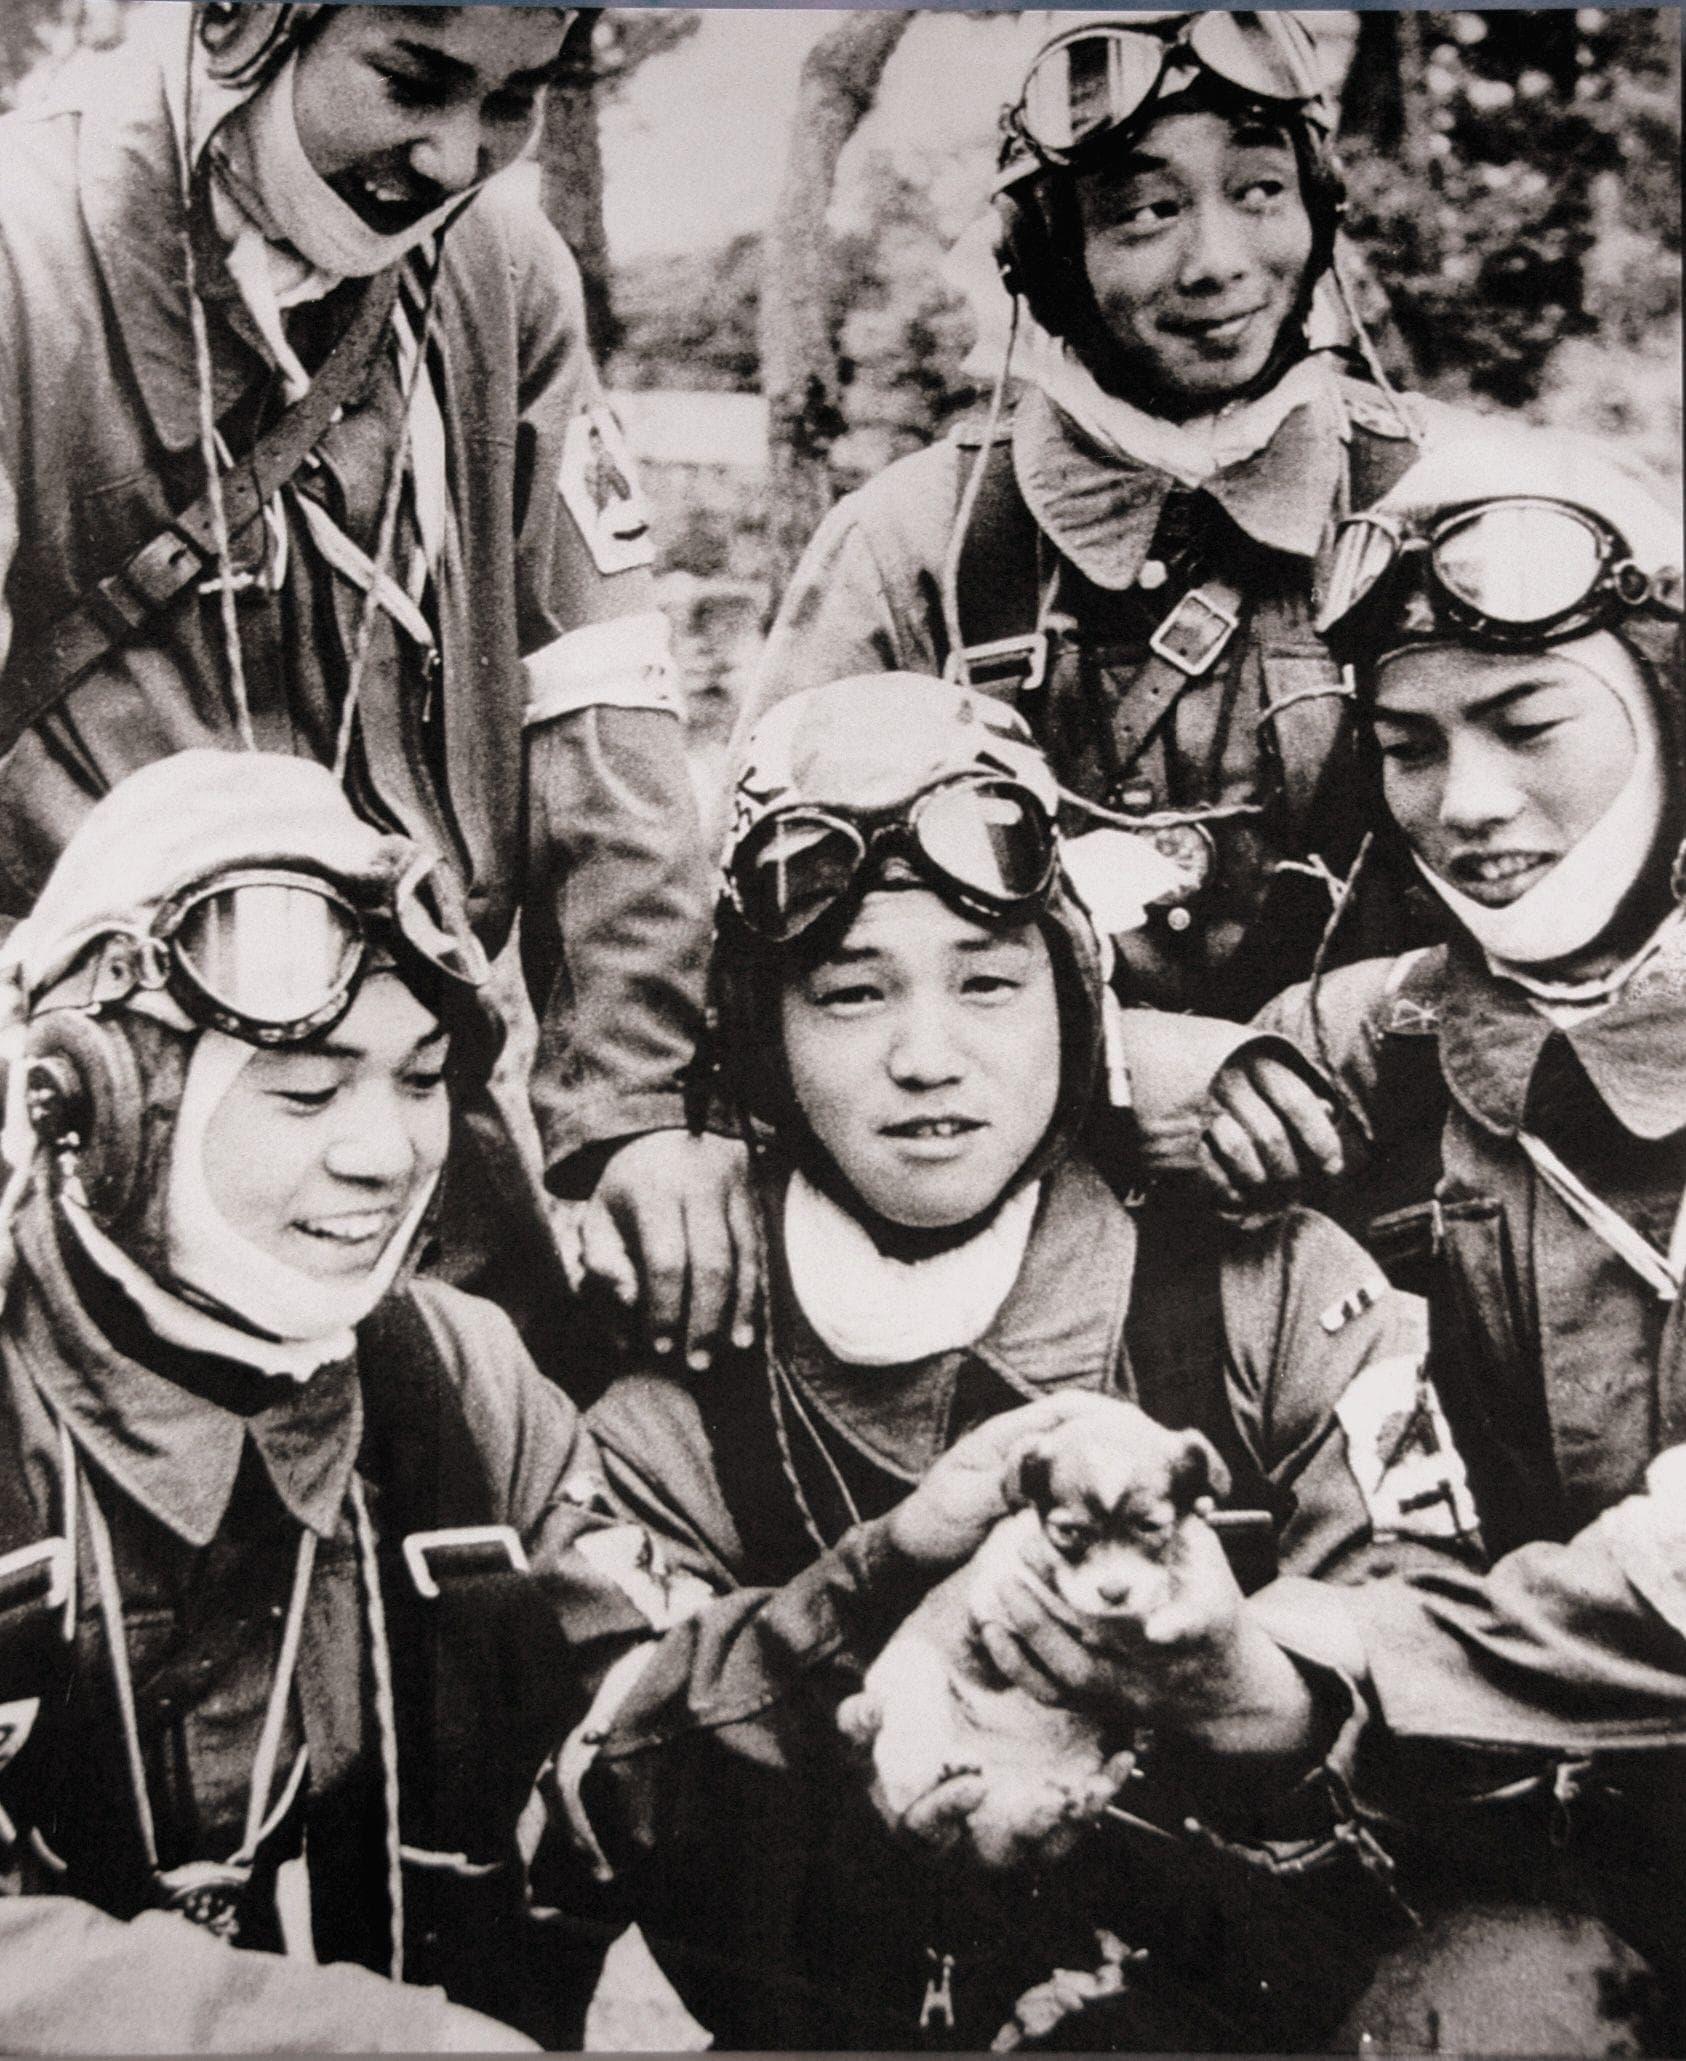 Random Fascinating Details About Lives Of Kamikaze Pilots